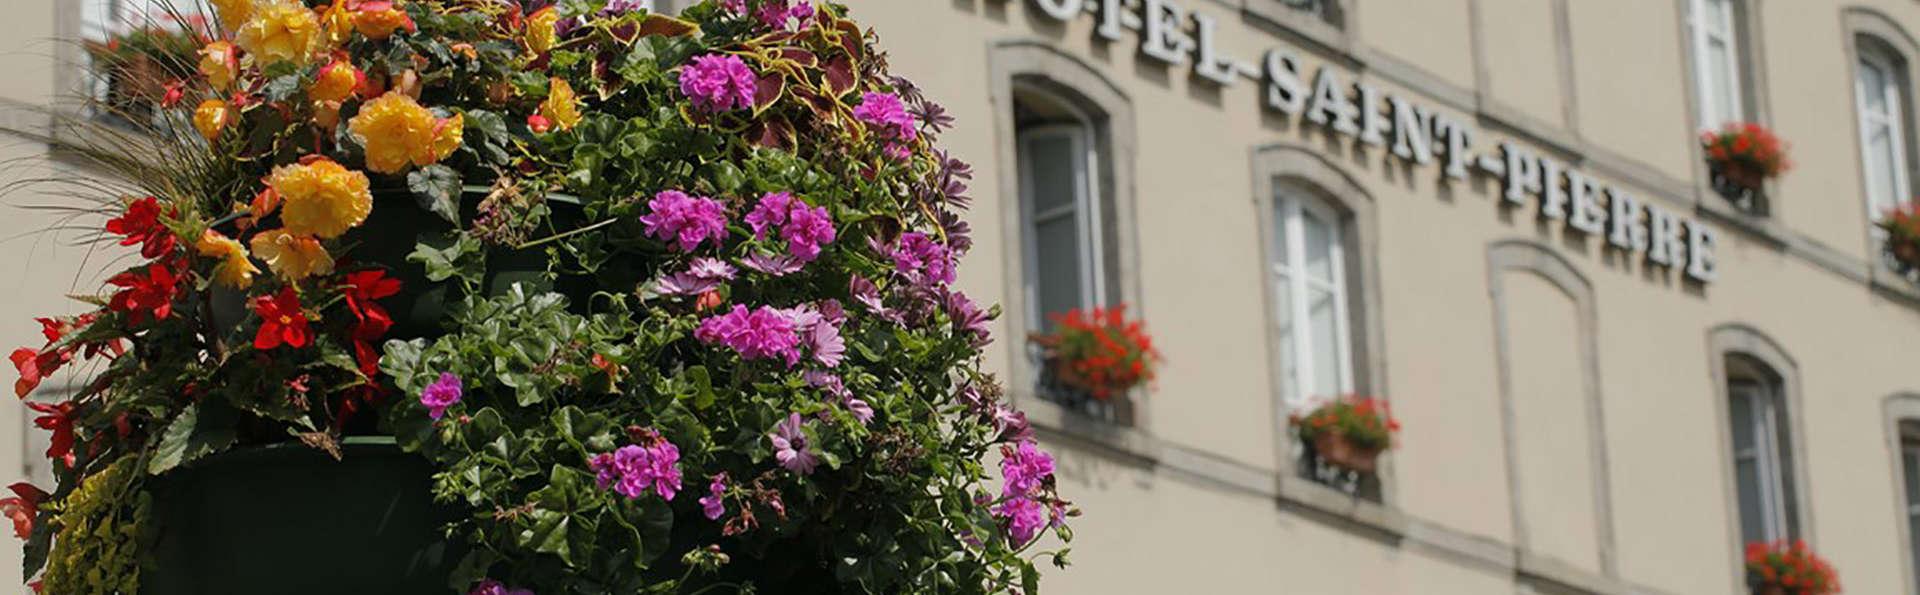 Hotel The Originals Aurillac Grand Hôtel Saint-Pierre (ex Qualys-Hotel) - EDIT_front1.jpg